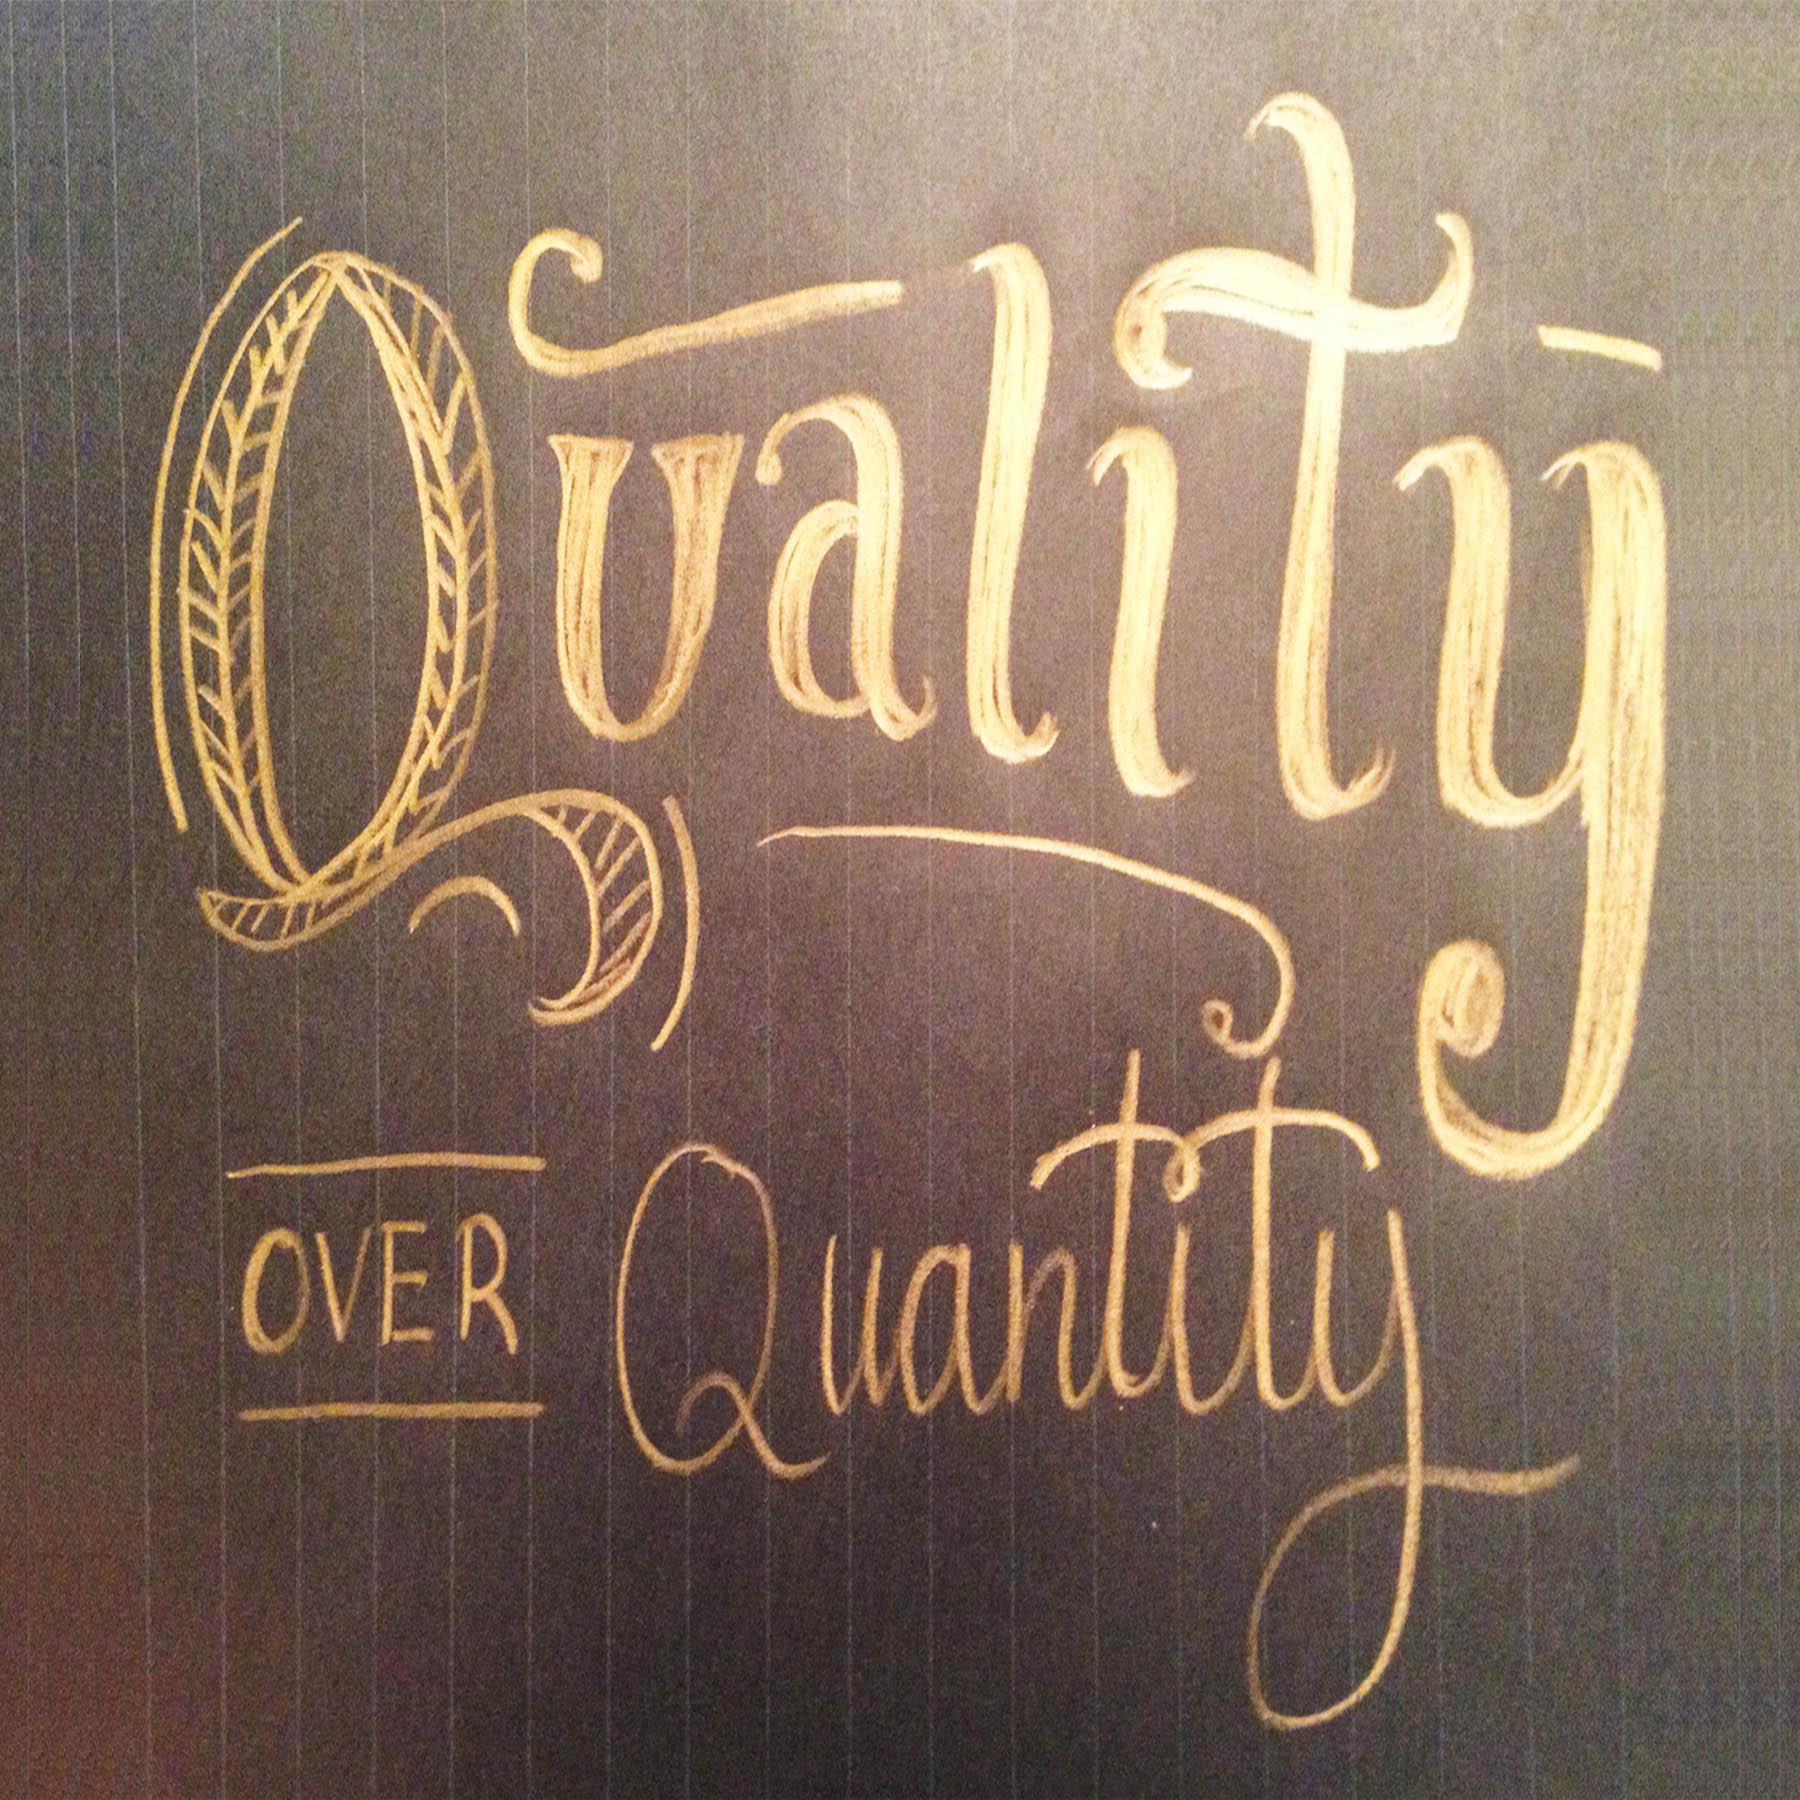 New Quality Image.jpg